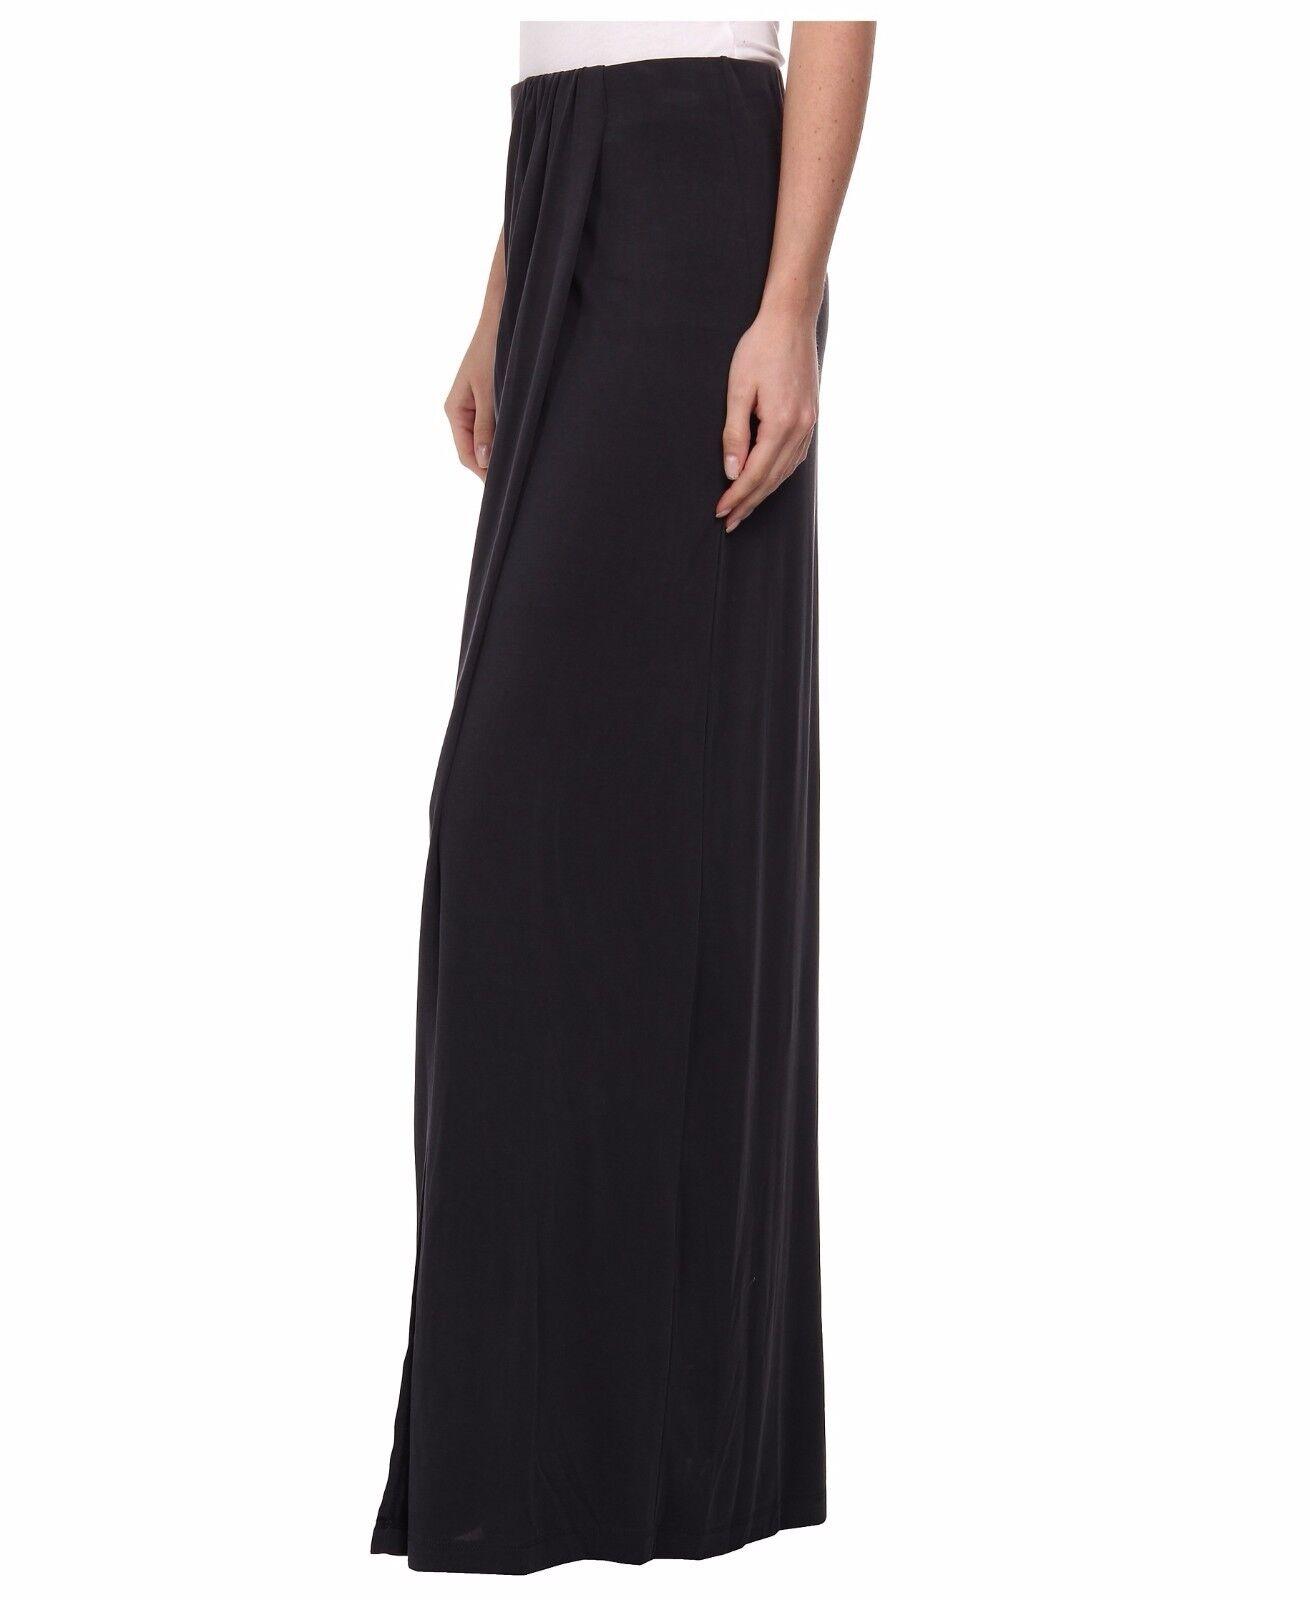 NEW BCBG MAXAZRIA Women Andreea Long Maxi Elastic Draped Skirt XS S M L